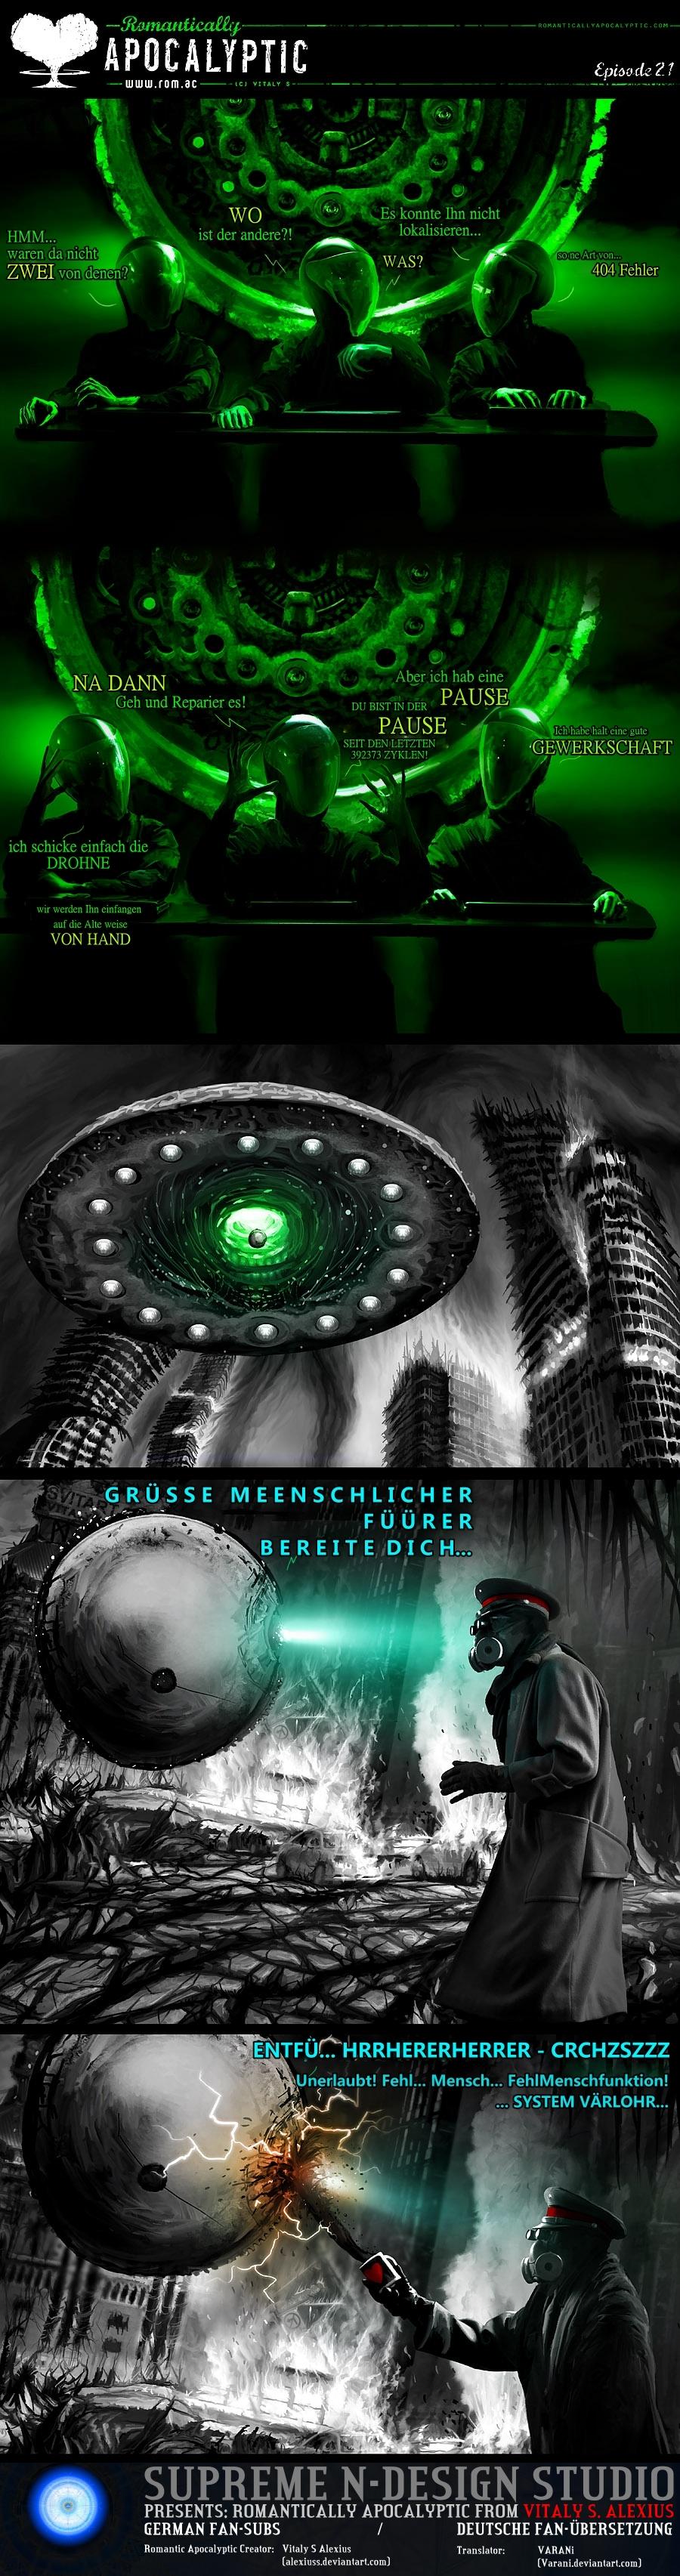 RA 21.DE - GERMAN TRANSLATION by Varani